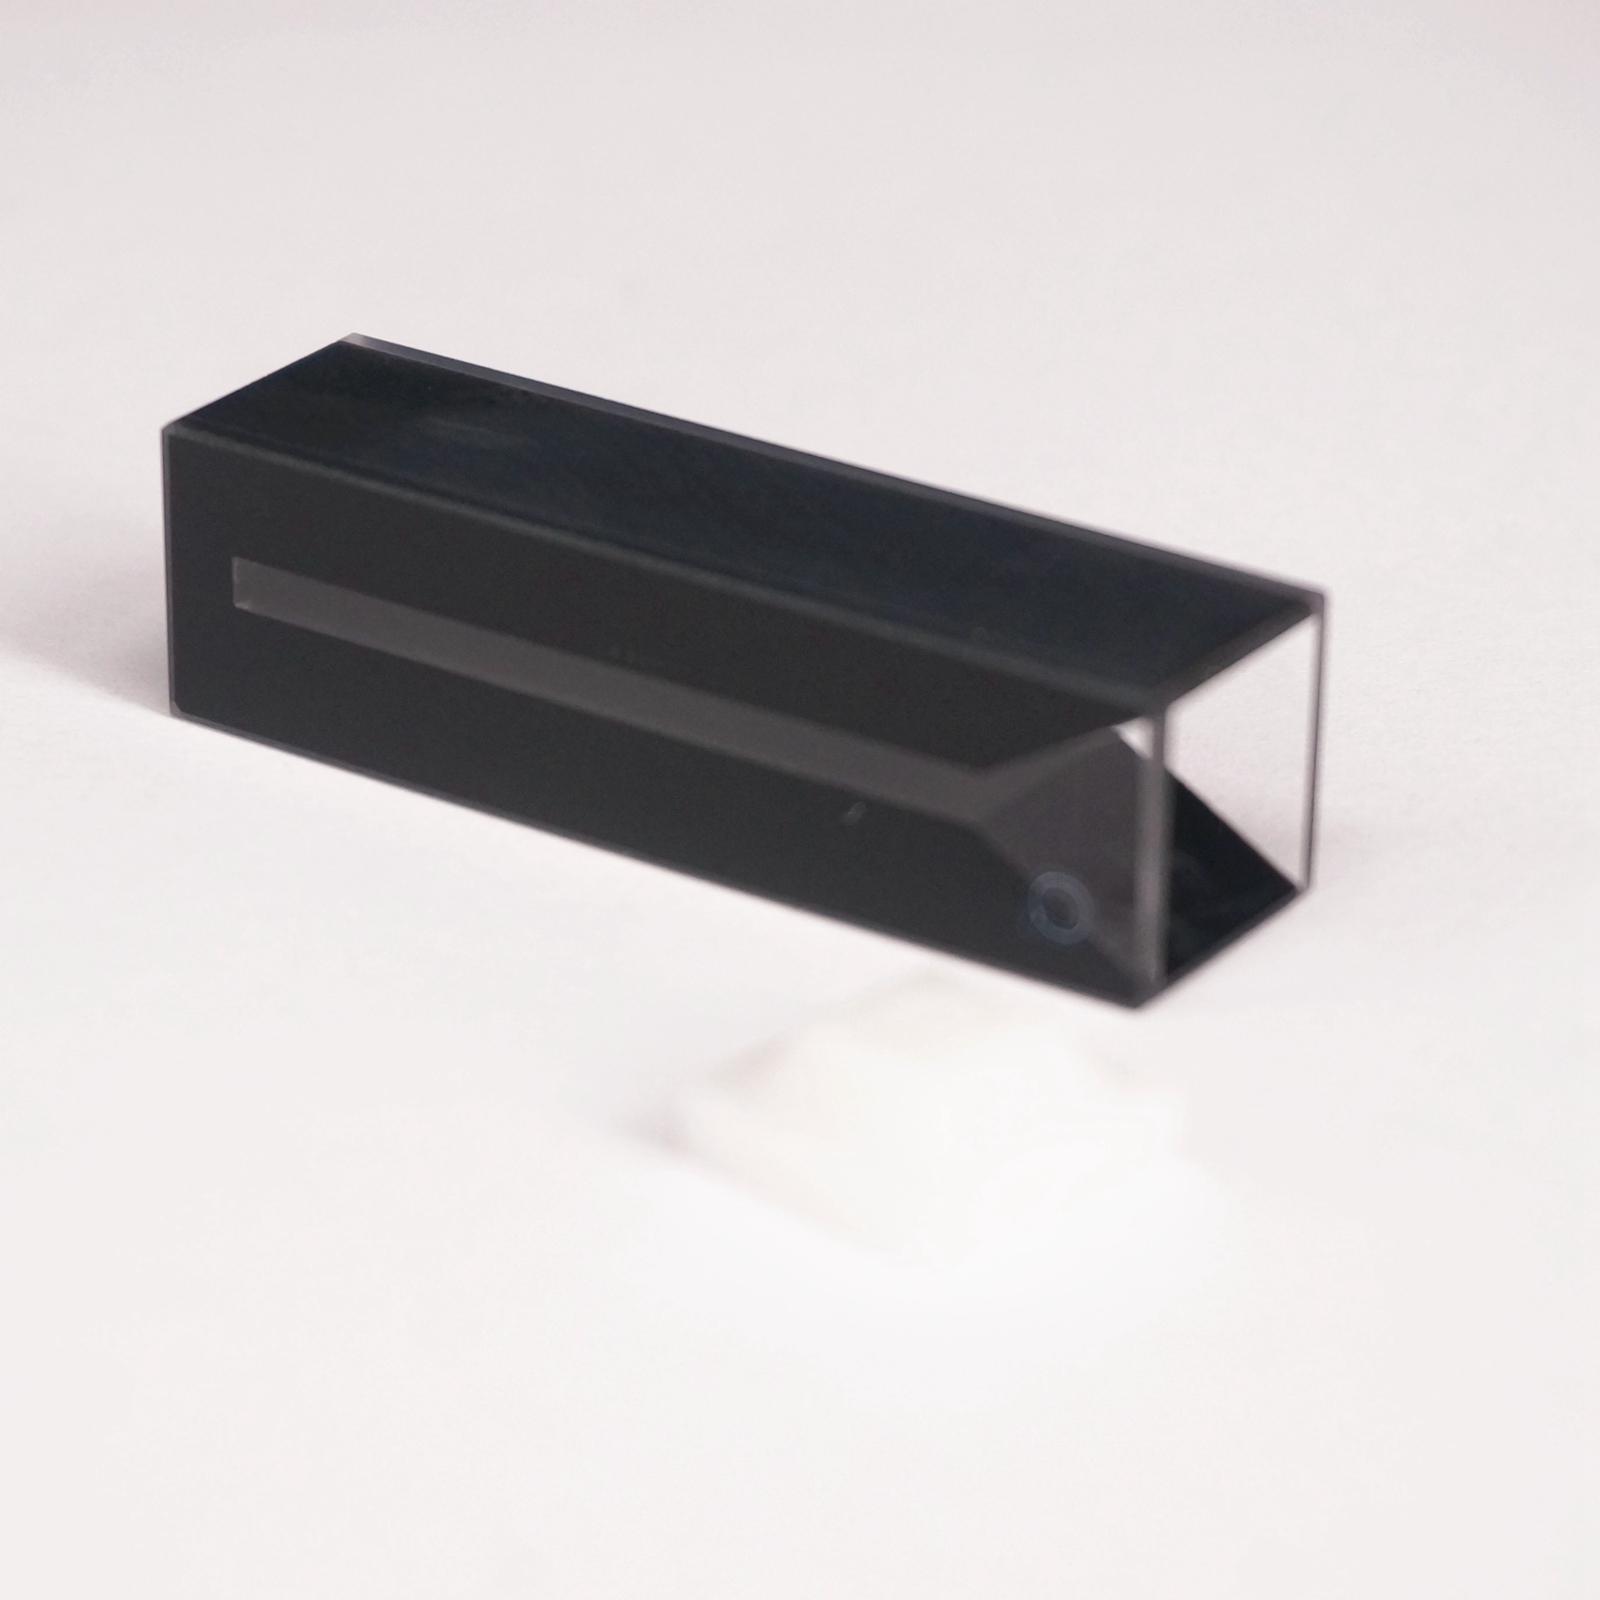 700ul 2mm Inside Width Micro JGS1 Quartz Cell With Black Walls And Lid700ul 2mm Inside Width Micro JGS1 Quartz Cell With Black Walls And Lid